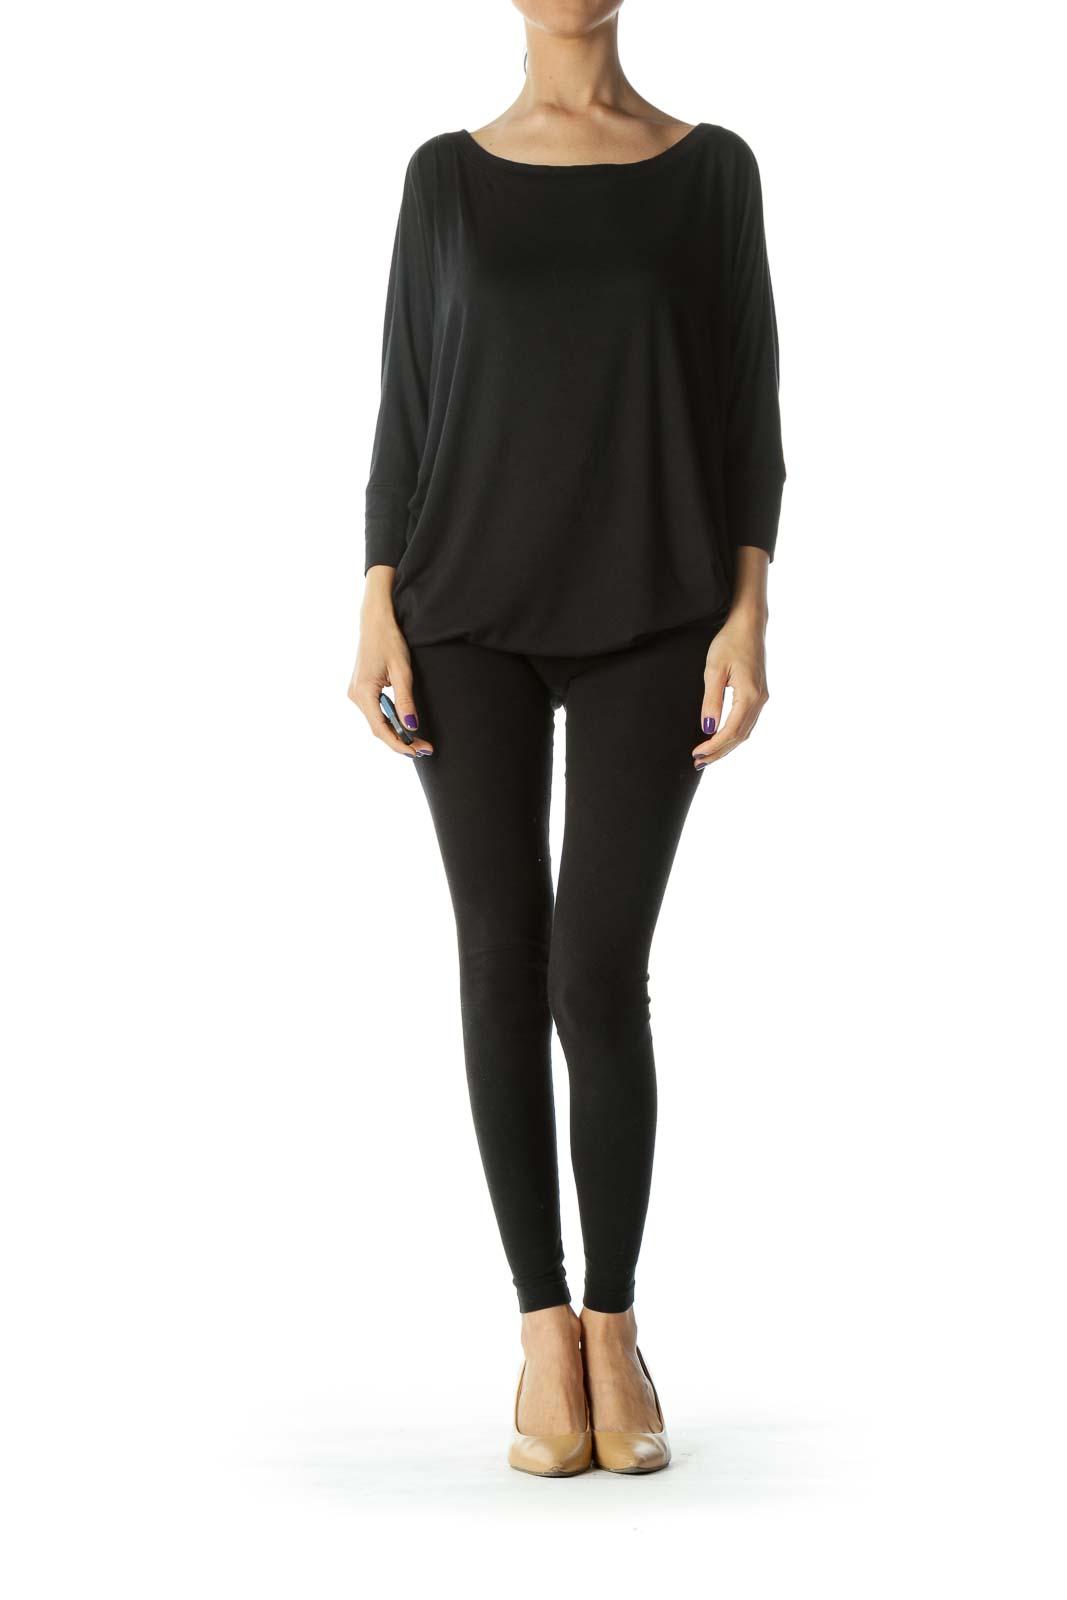 Black Round-Neck Bat-Sleeves Soft Stretch Jersey Top